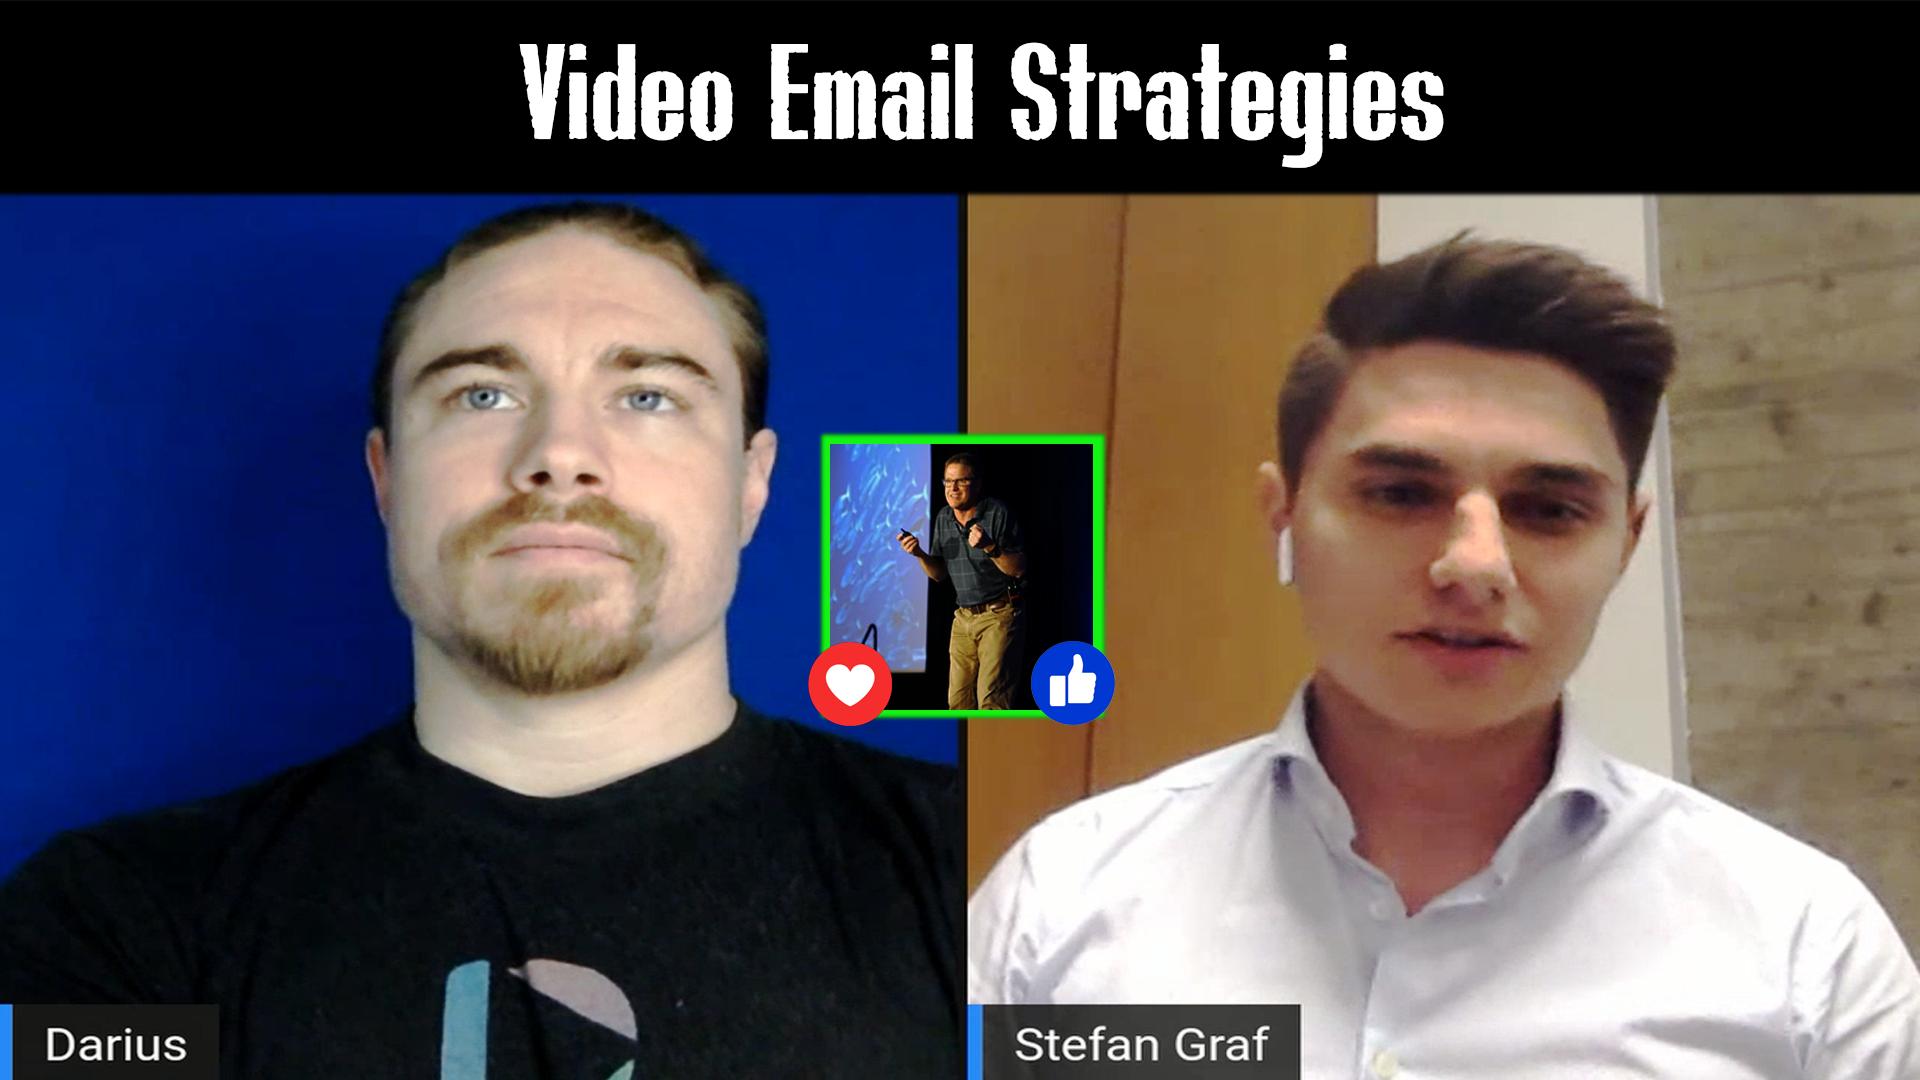 Video Email Strategies for Digital Agencies